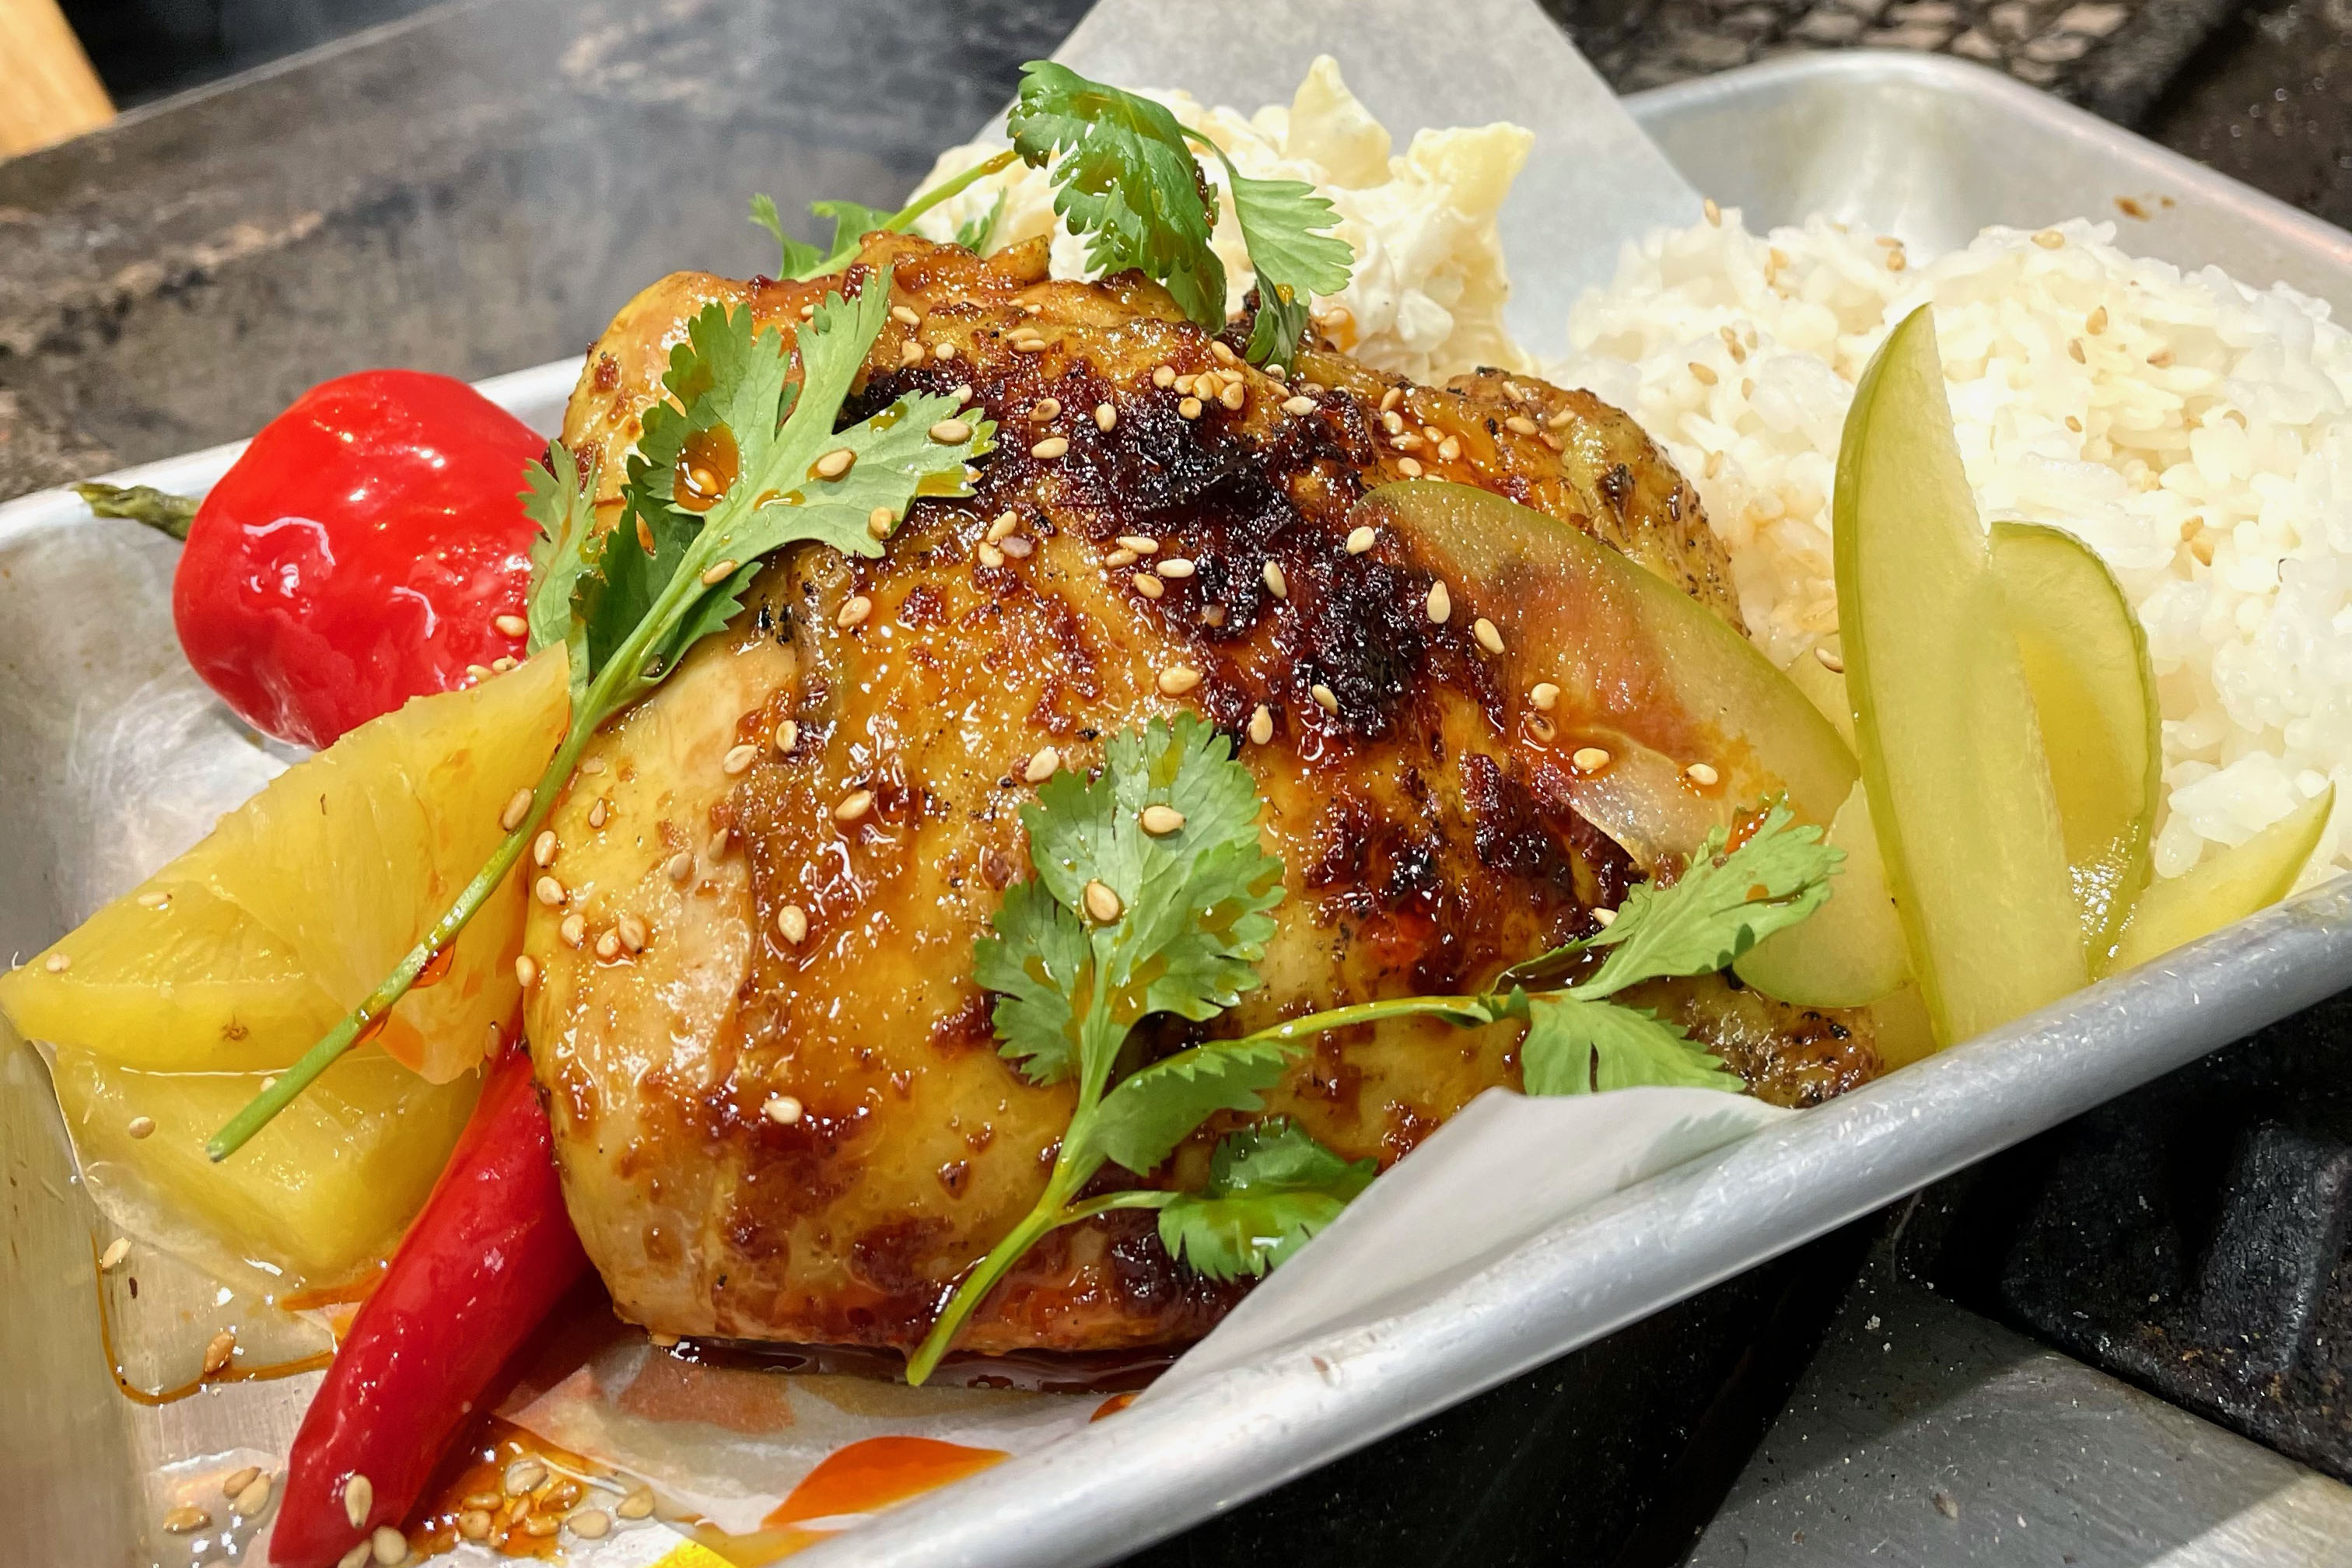 Salty Cargo's huli huli chicken